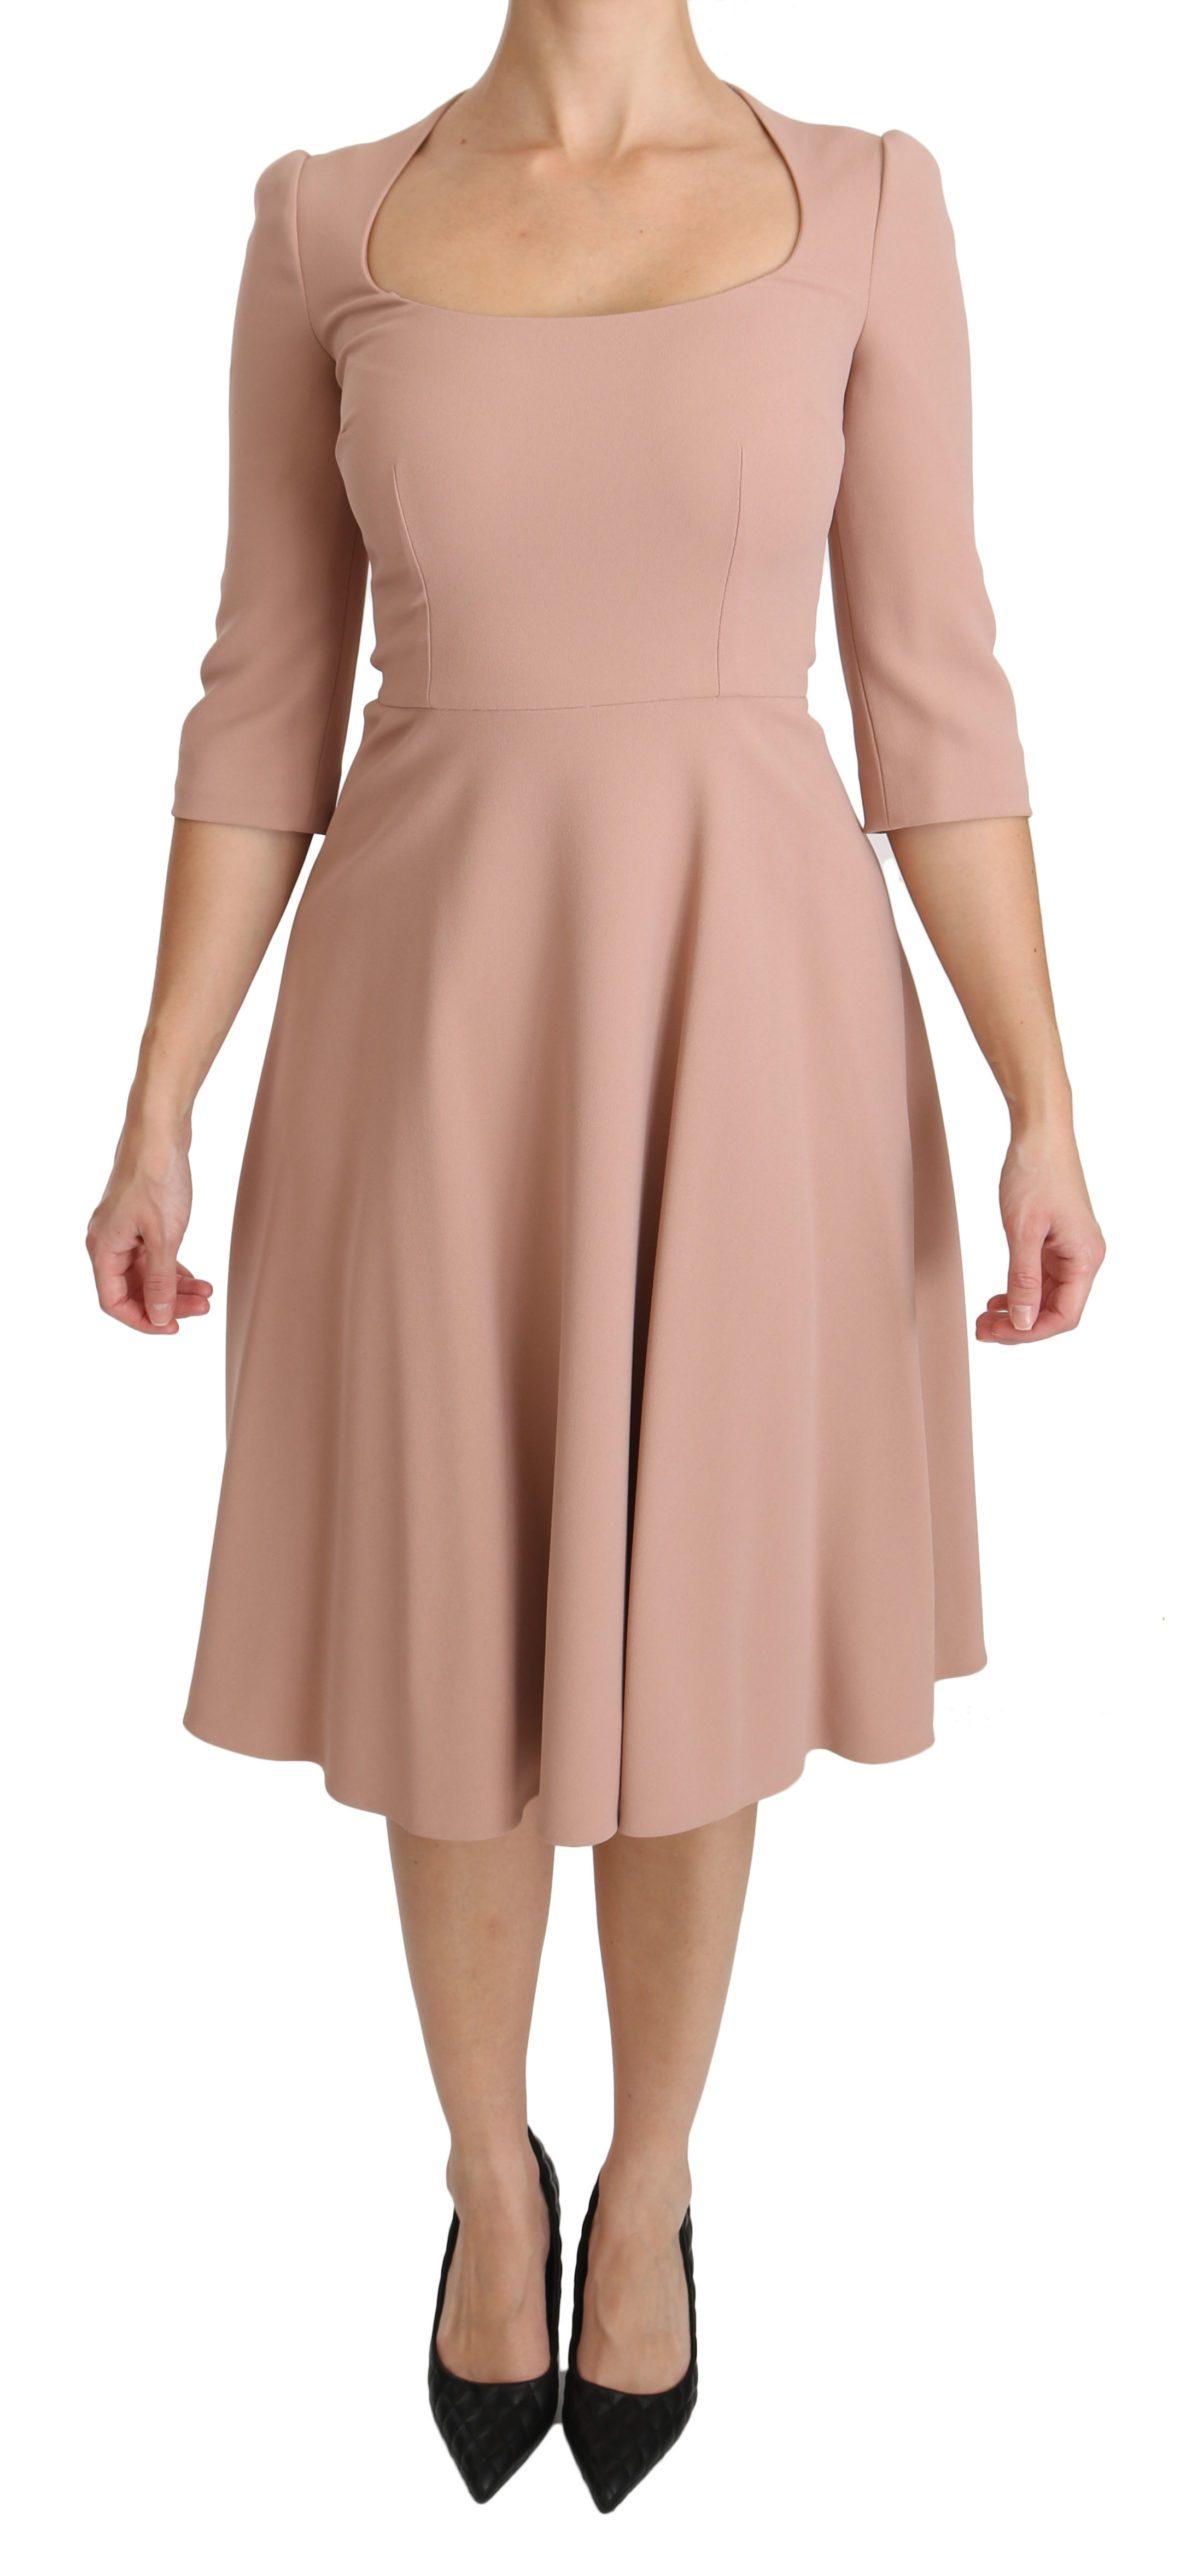 Dolce & Gabbana Women's 3/4 Sleeves A-line Viscose Dress Pink DR2100 - IT38 XS